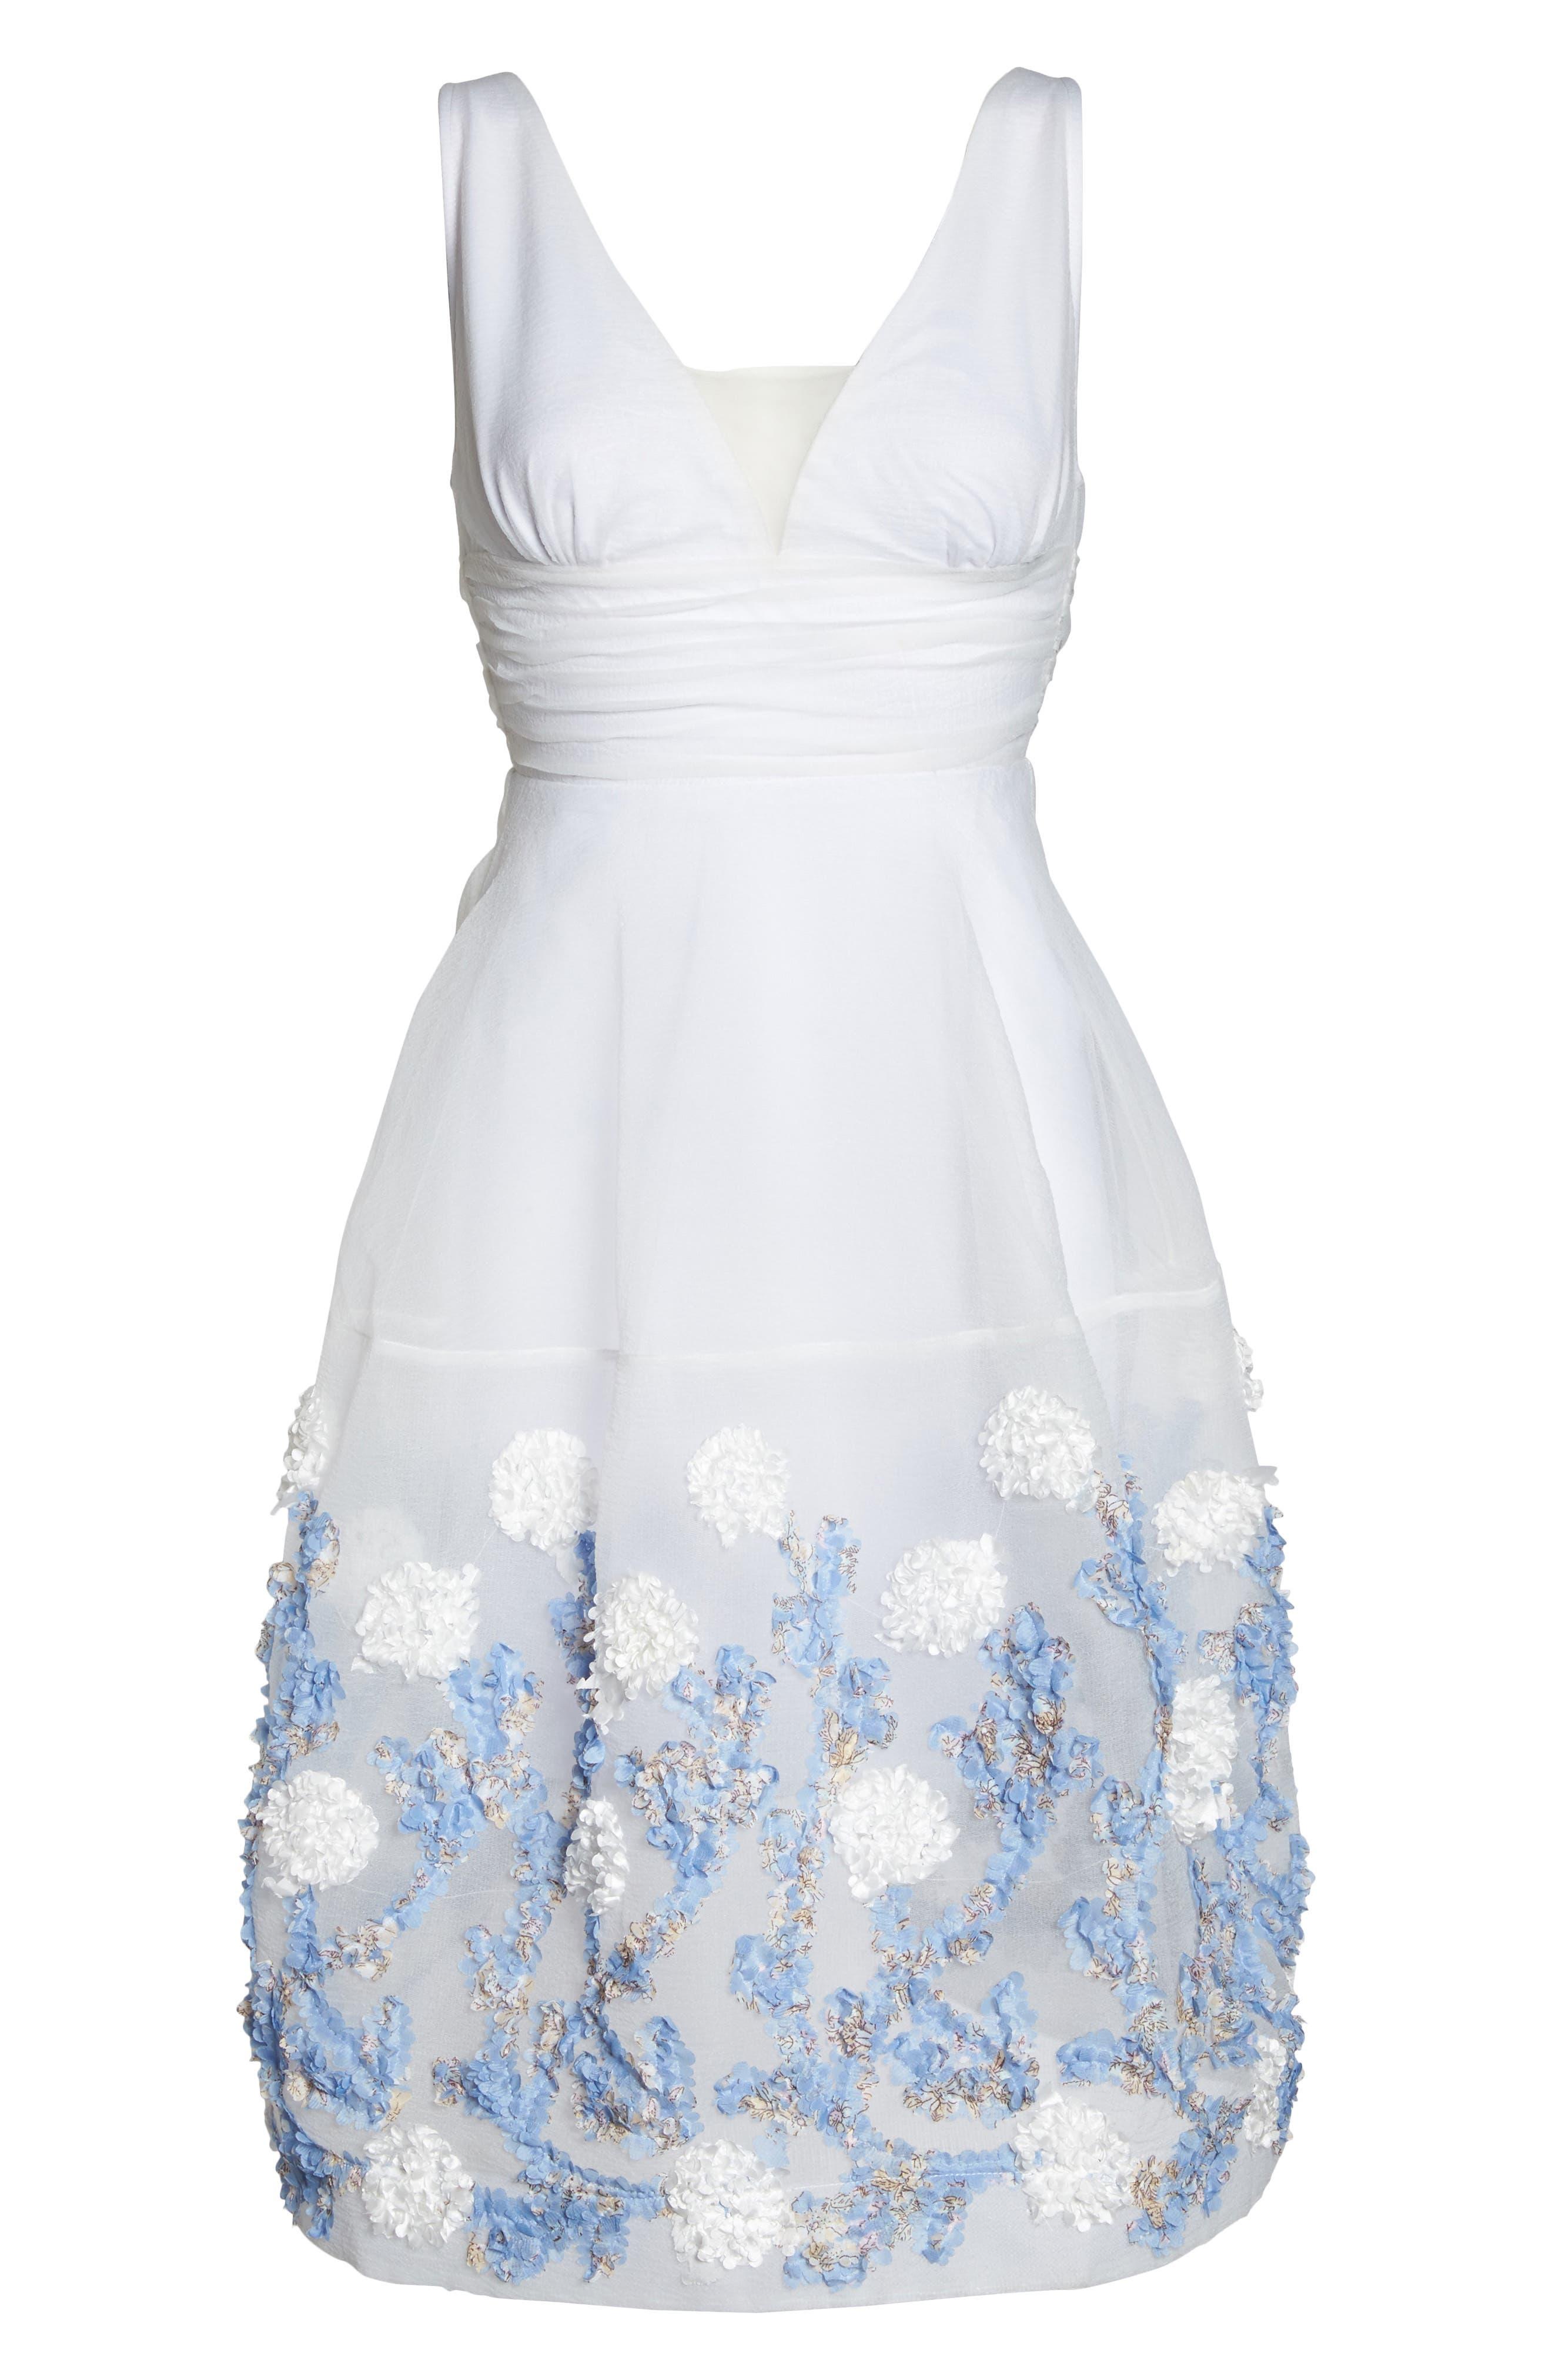 Malvina Embroidered Hem Fit & Flare Dress,                             Alternate thumbnail 5, color,                             White/ Blue